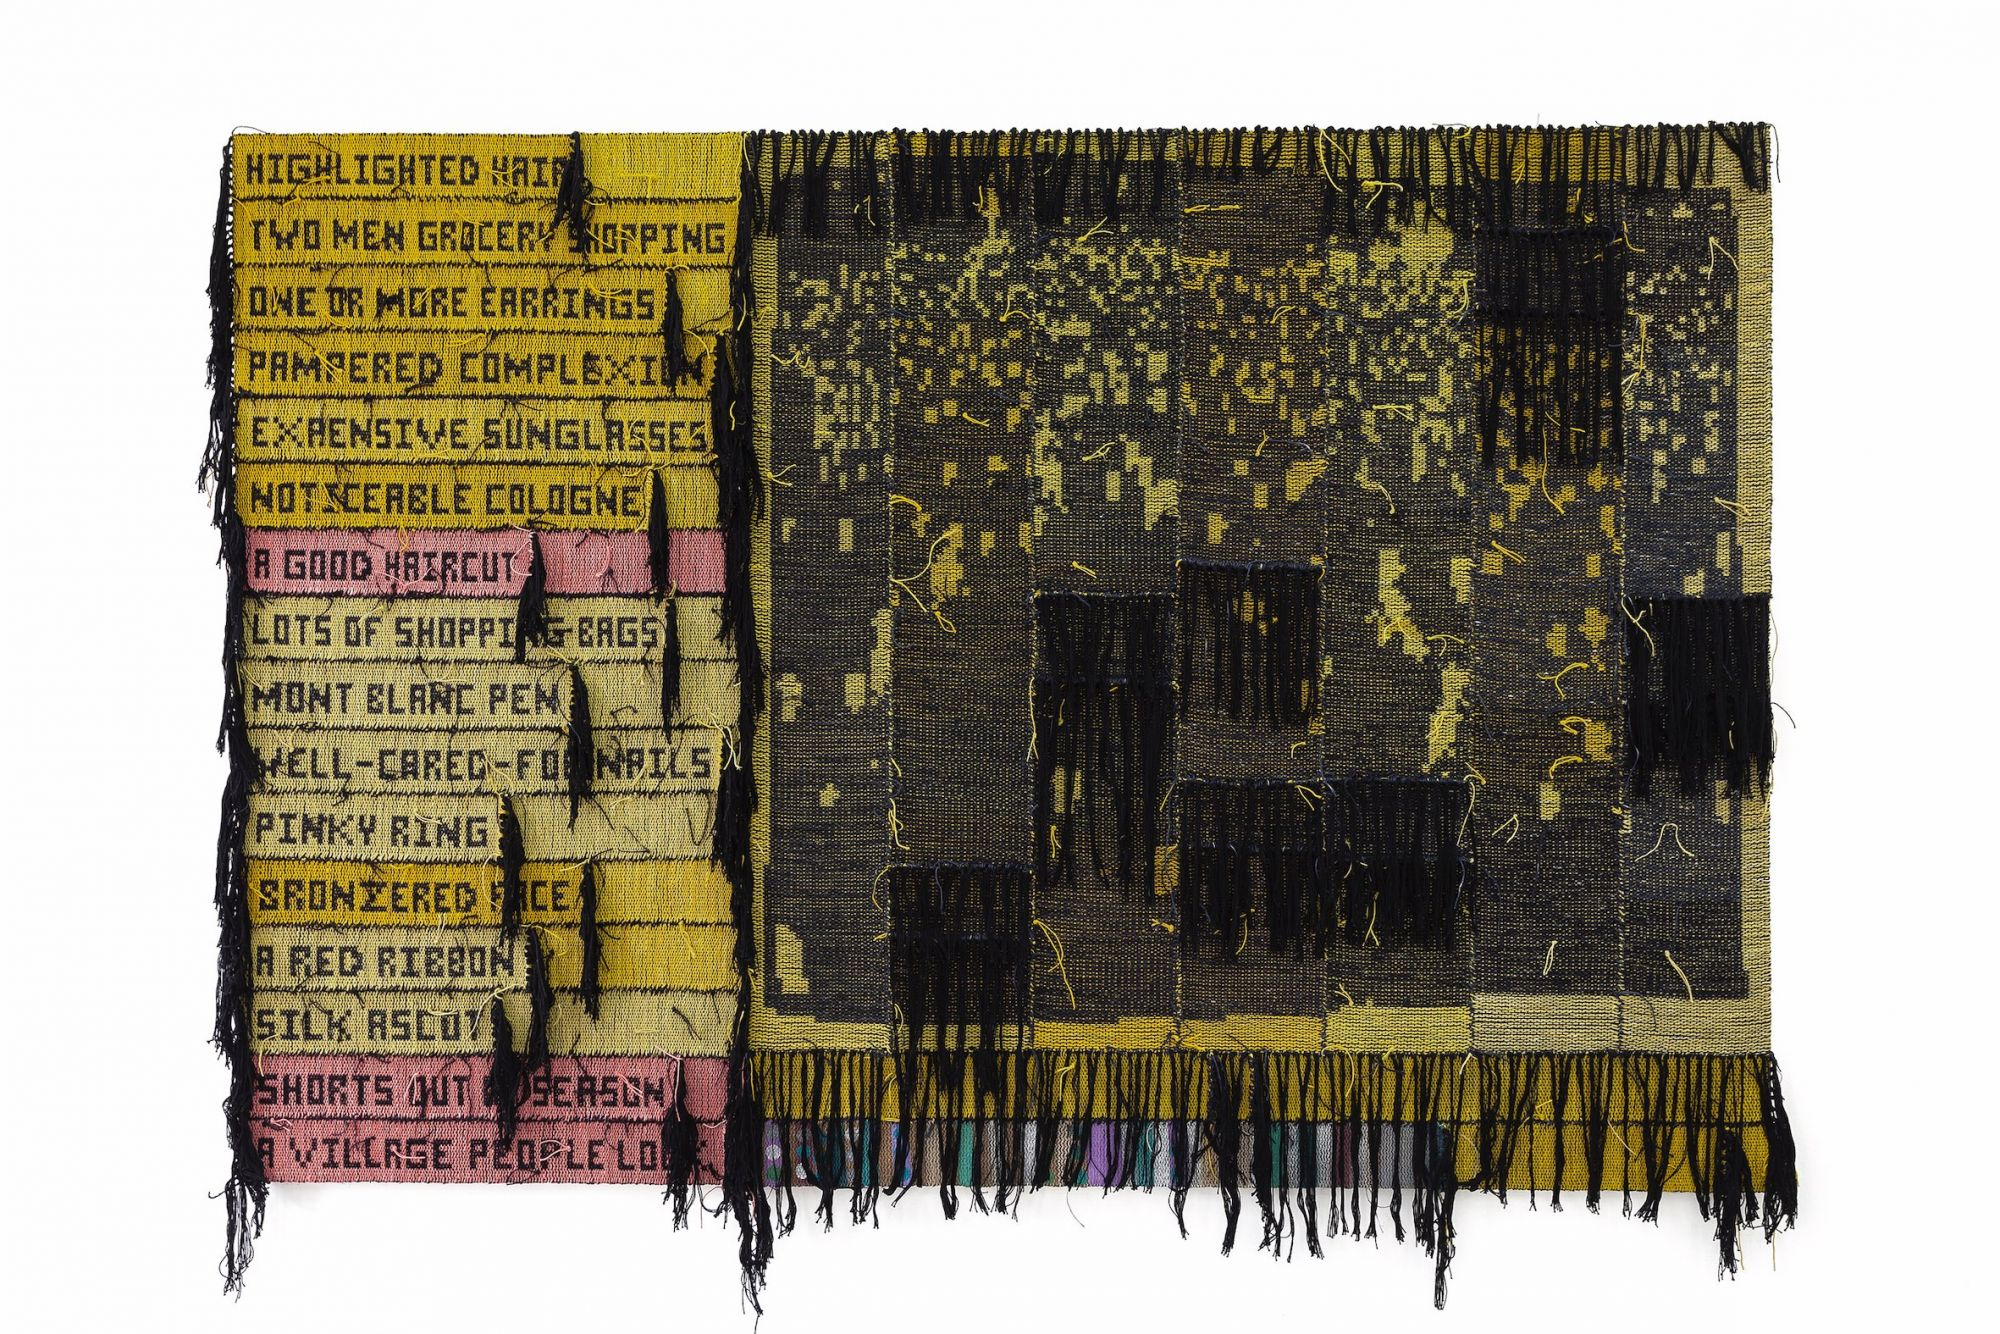 'A Positive Light' by American textile artist Josh Faught